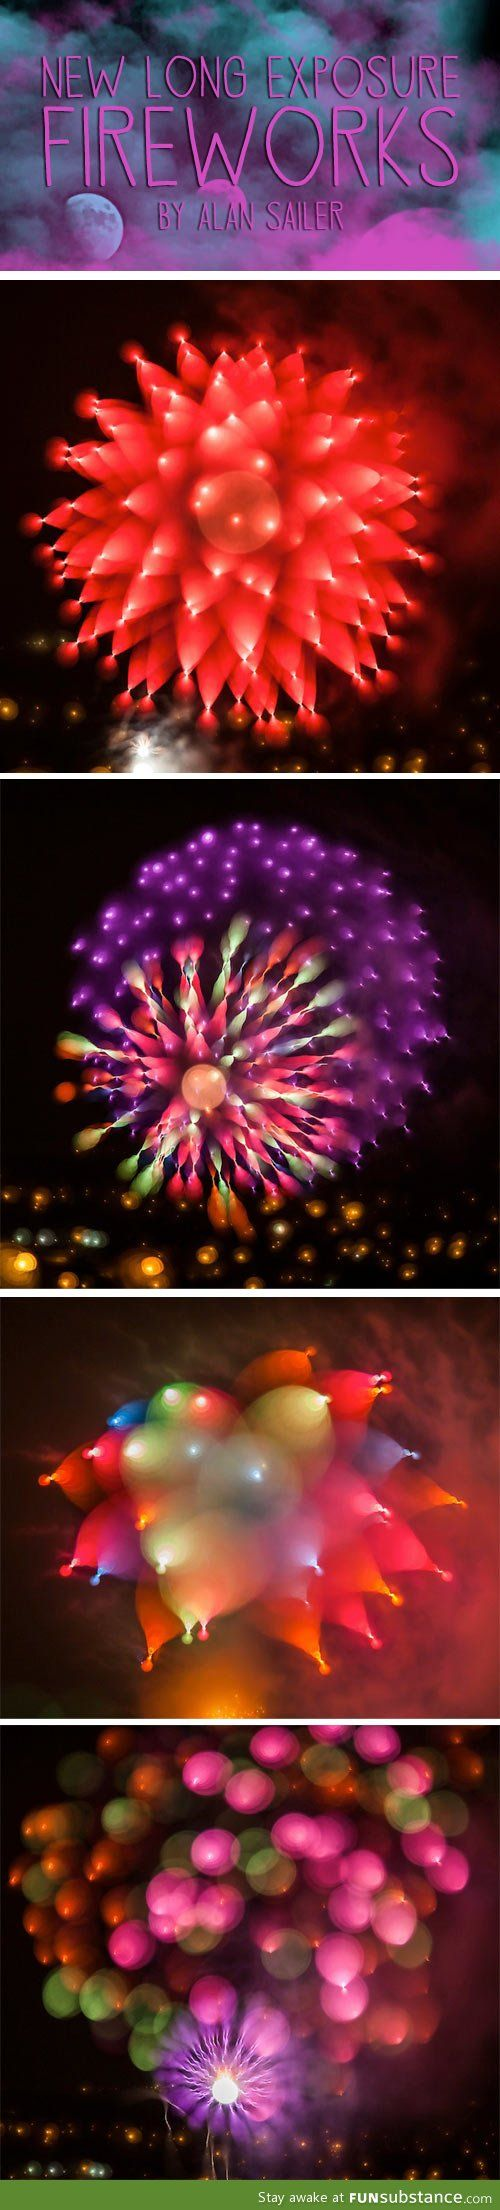 Long exposure fireworks.